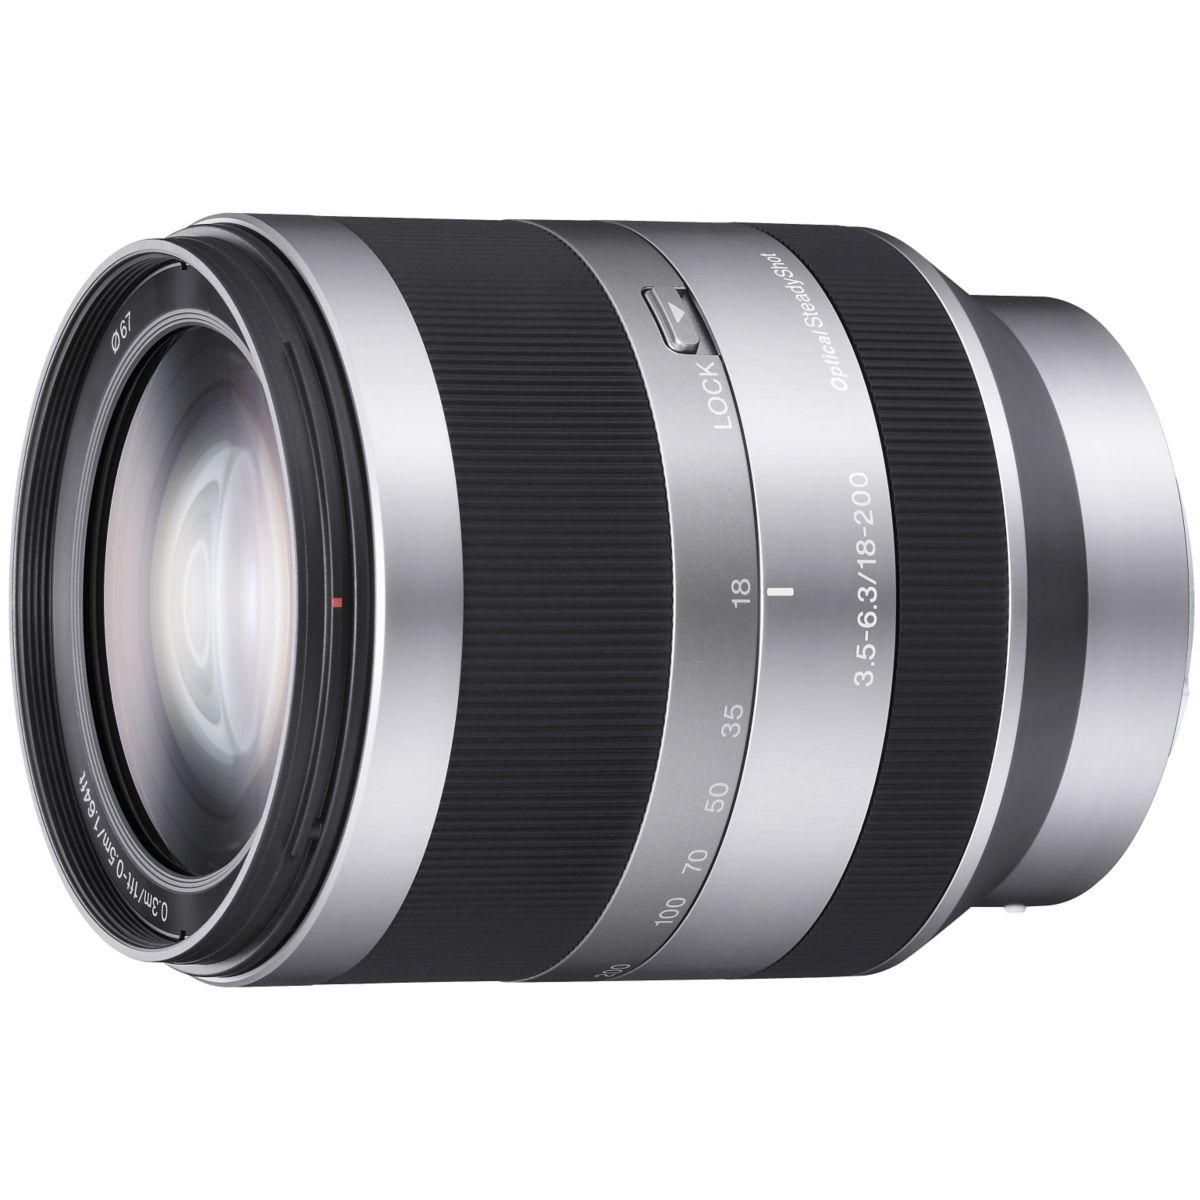 Objectif SONY 18-200mm f/3,5-6,3 ref SEL18200.AE pour NEX